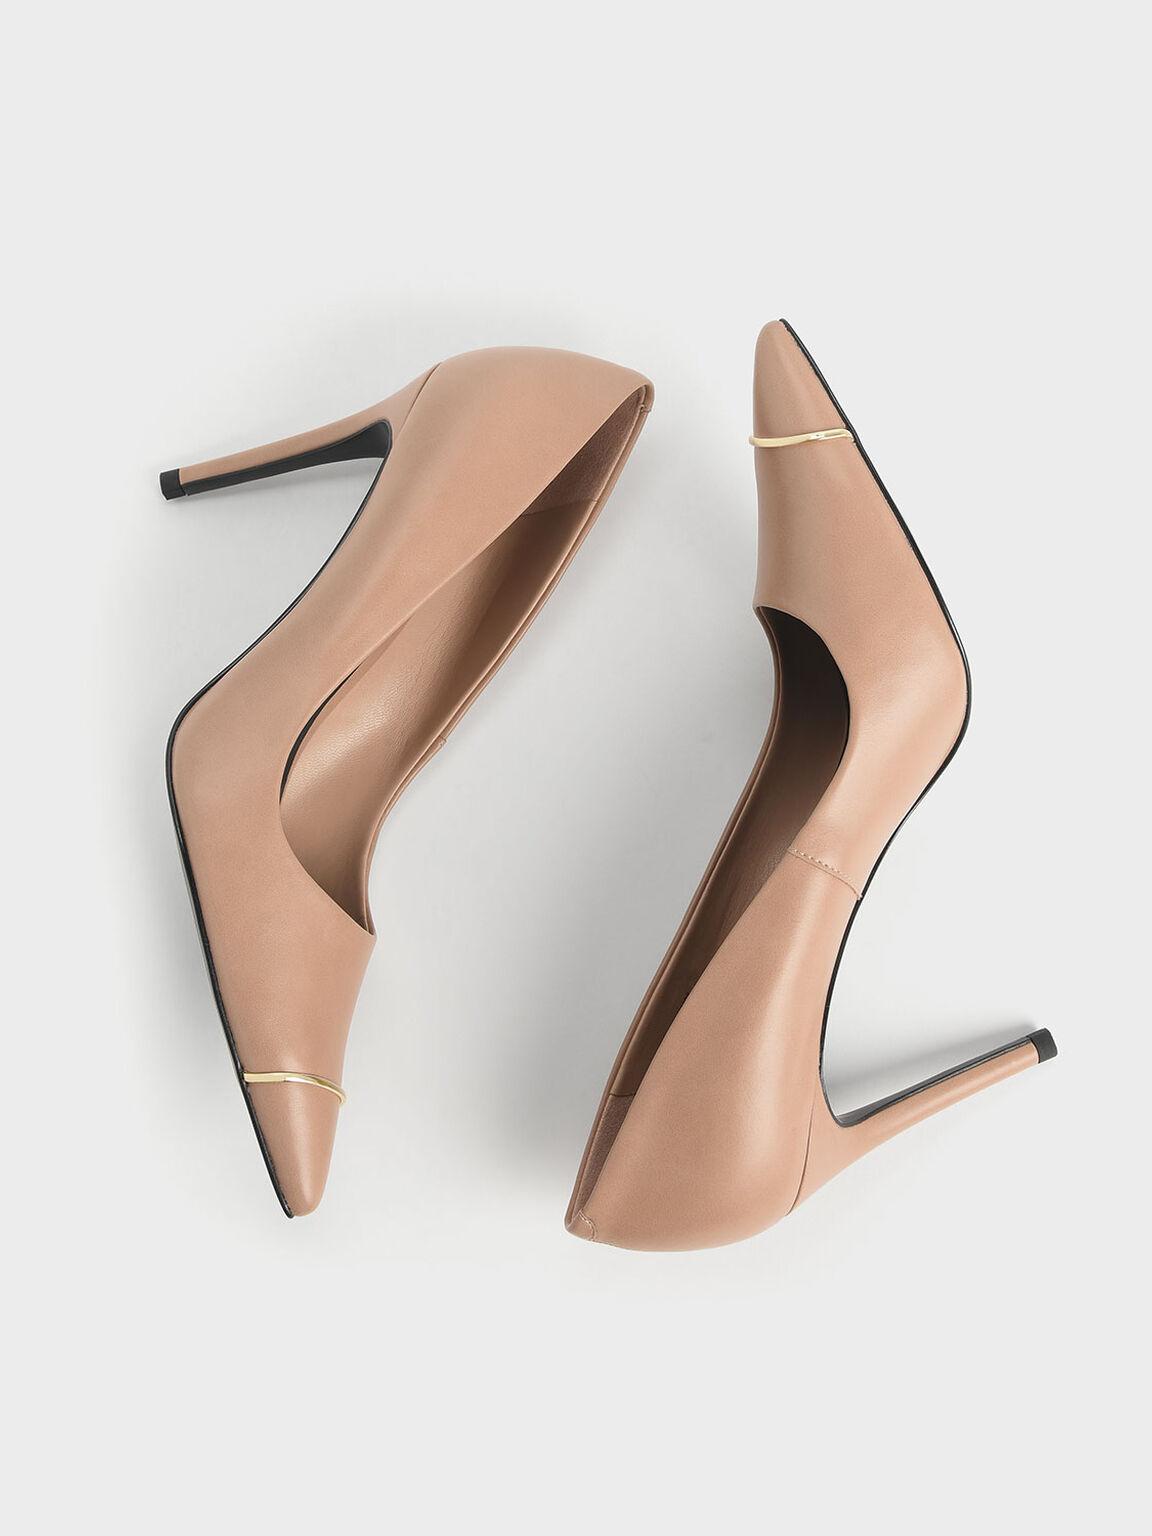 Metallic Accent Pointed Toe Stiletto Pumps, Nude, hi-res